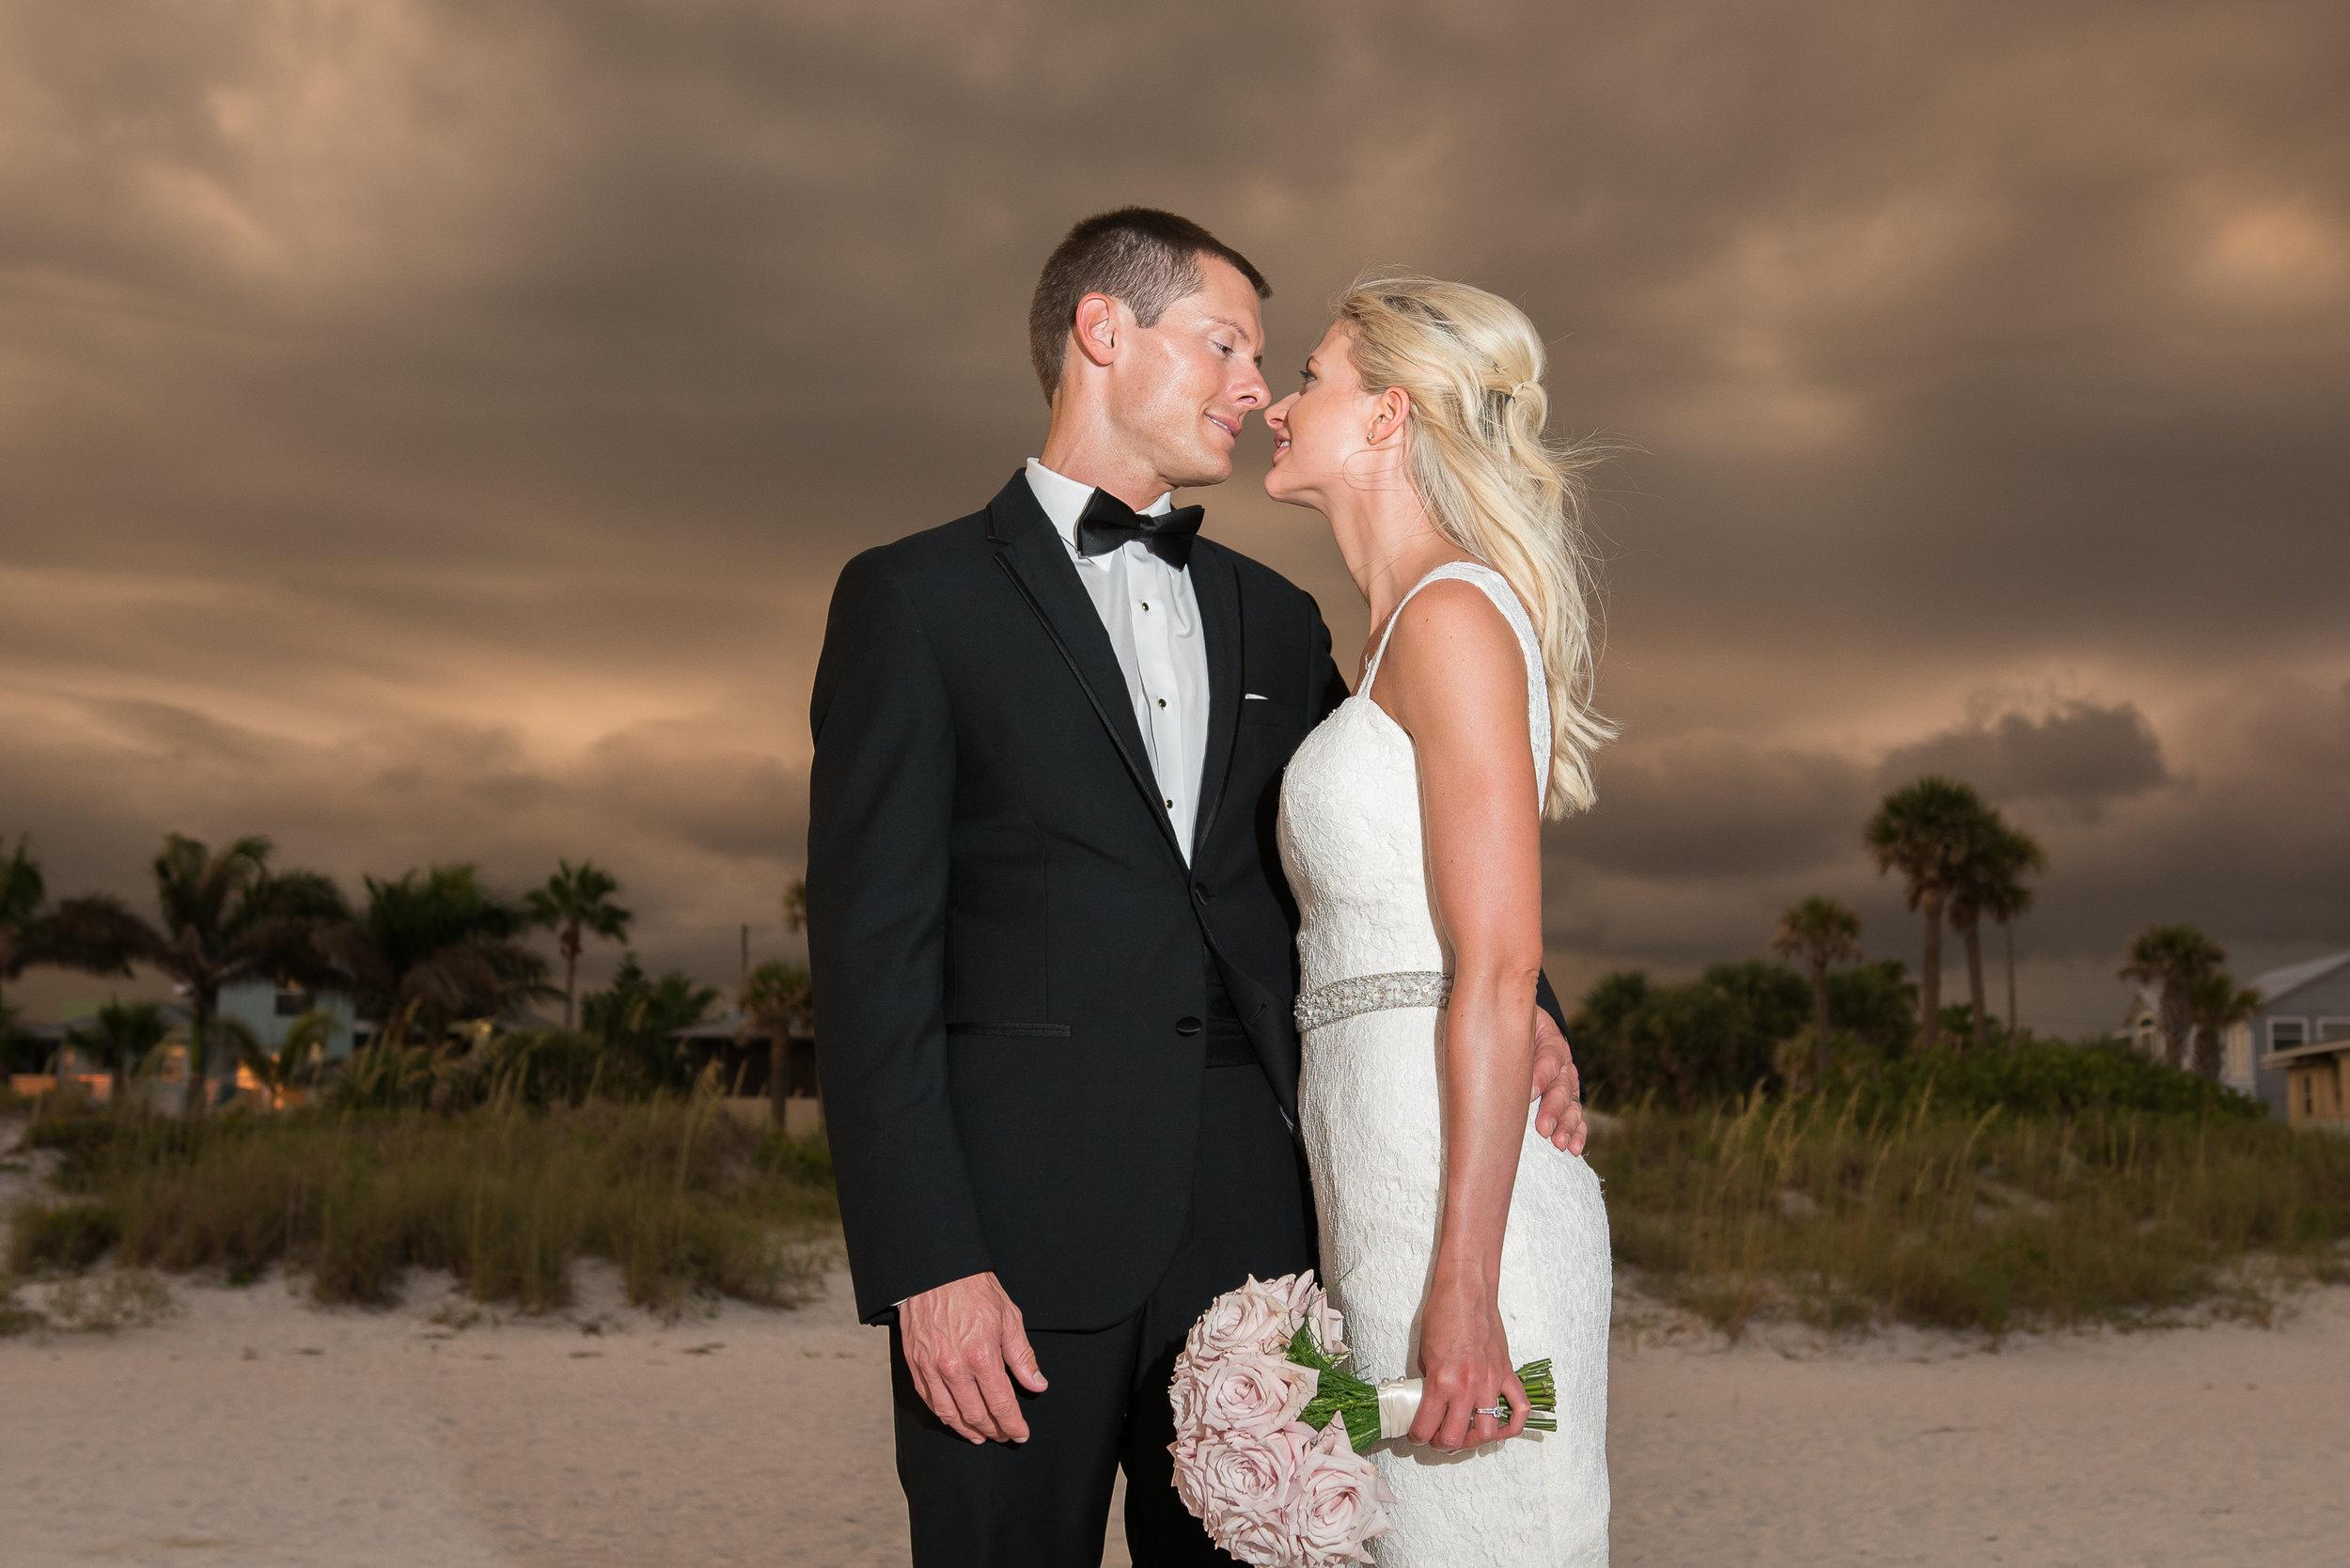 Tampa wedding photographer, St.Pete wedding photographer